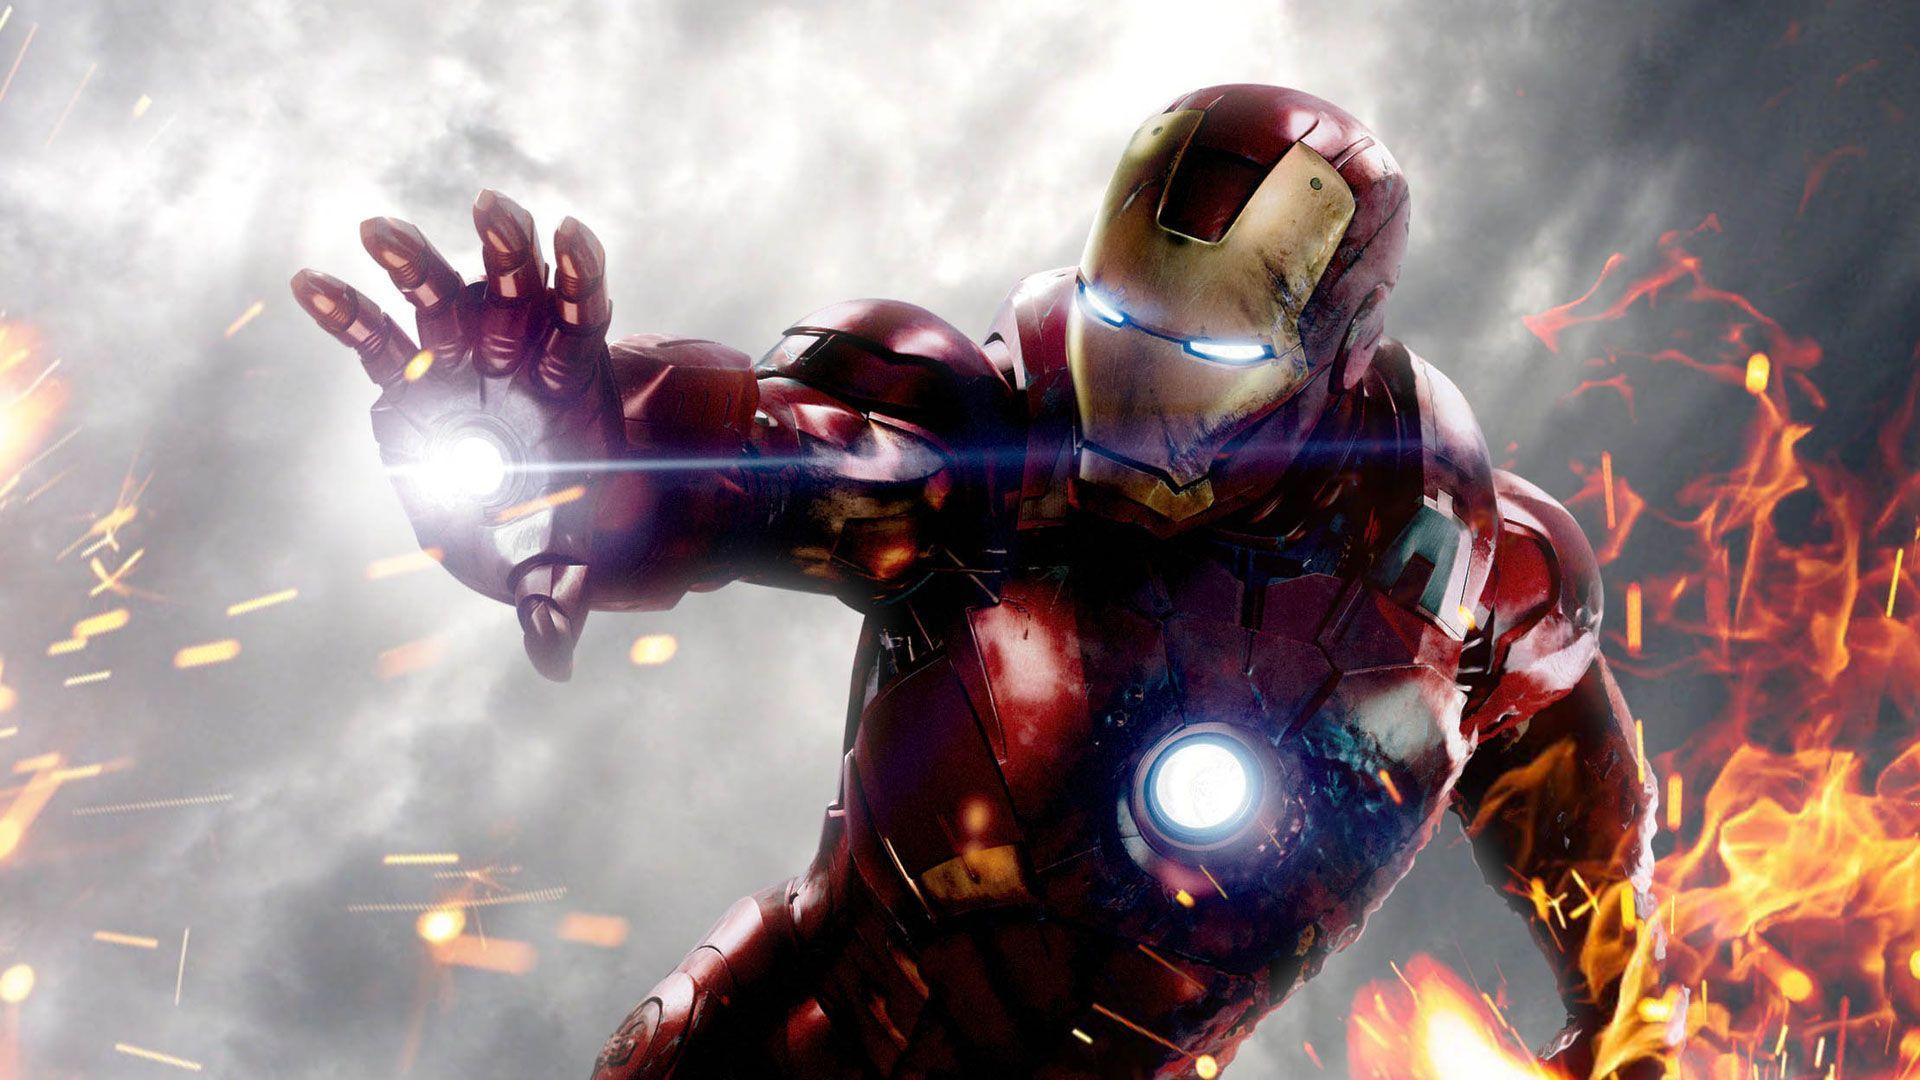 Iron Man Hd Wallpapers 1080p Wallpaper Cave